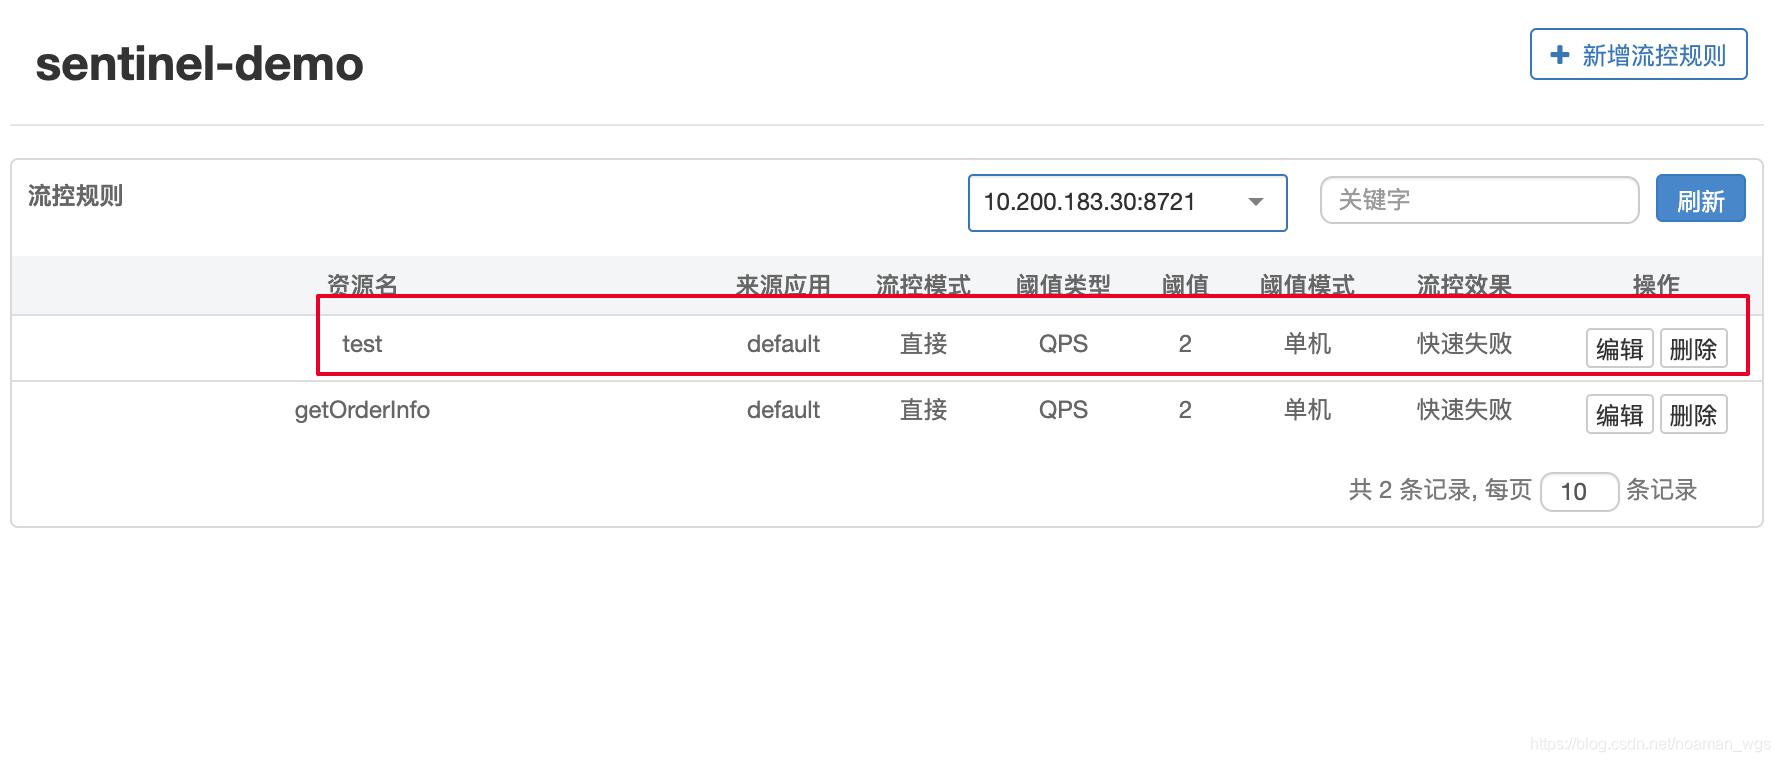 [外链图片转存失败,源站可能有防盗链机制,建议将图片保存下来直接上传(img-BxQdvVMd-1575117332209)(/Users/wanggenshen/Library/Application%20Support/typora-user-images/image-20191130201331799.png)]